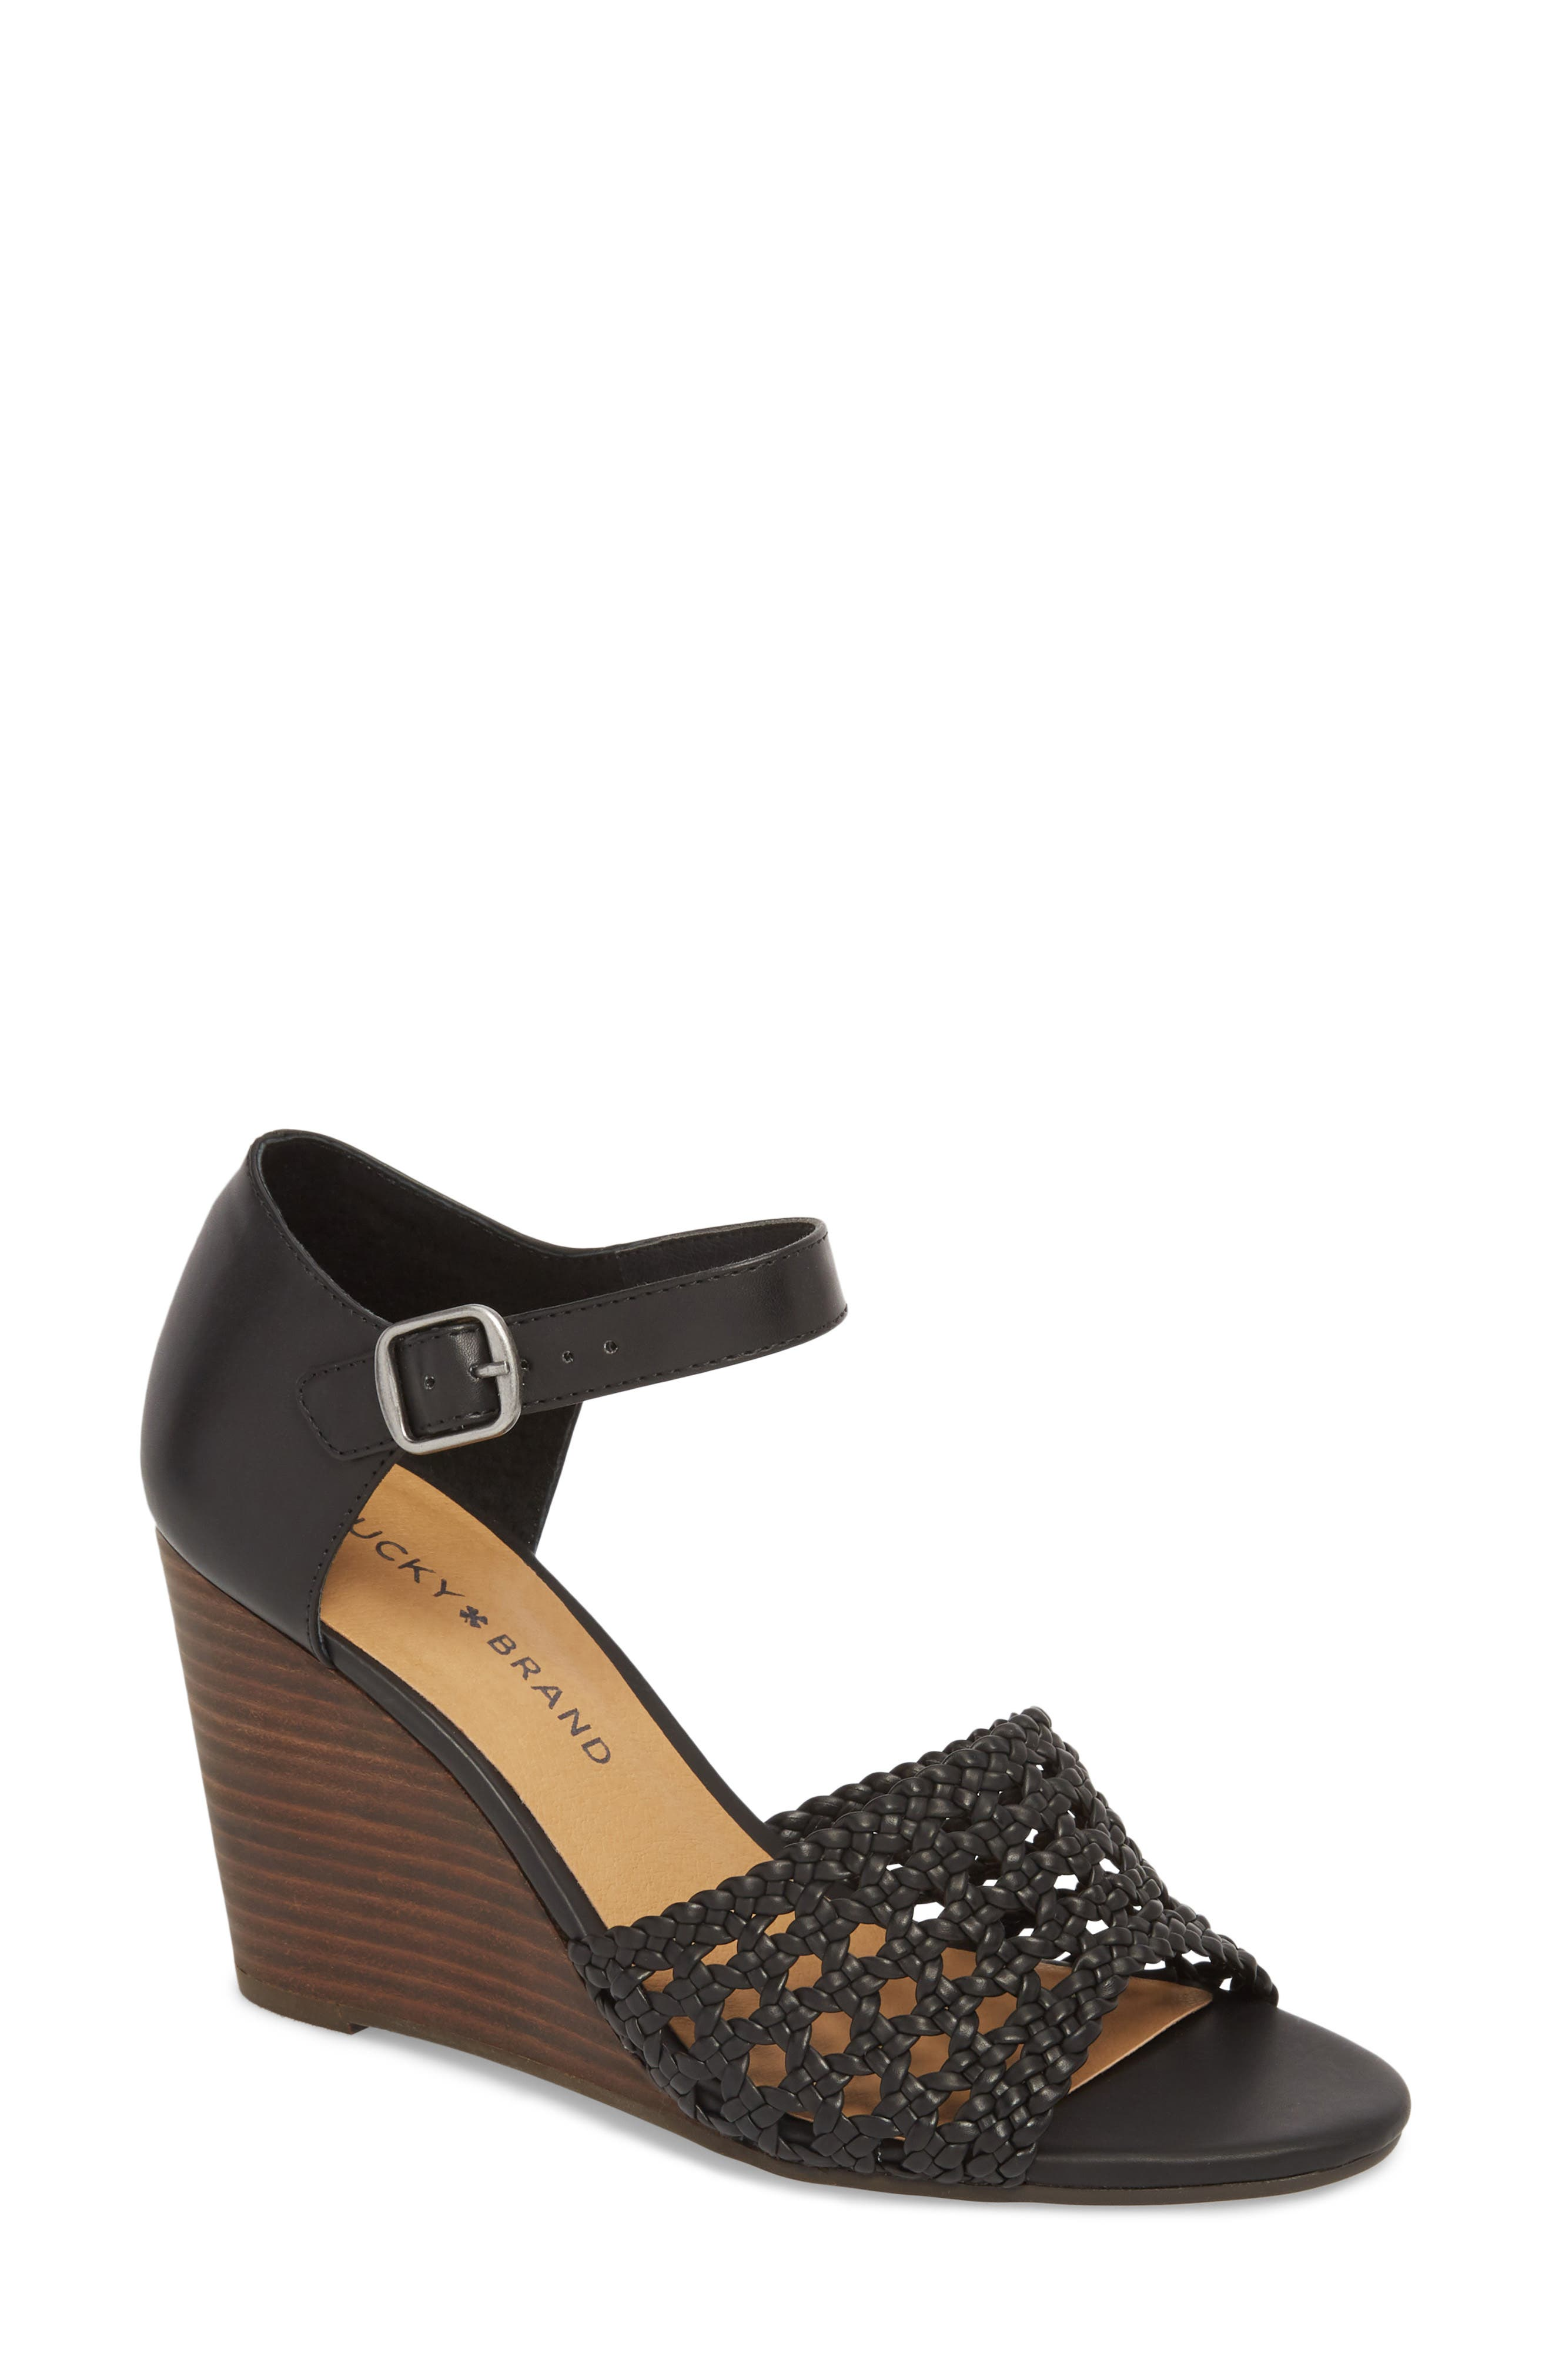 Rabekka Wedge Sandal,                         Main,                         color, BLACK LEATHER